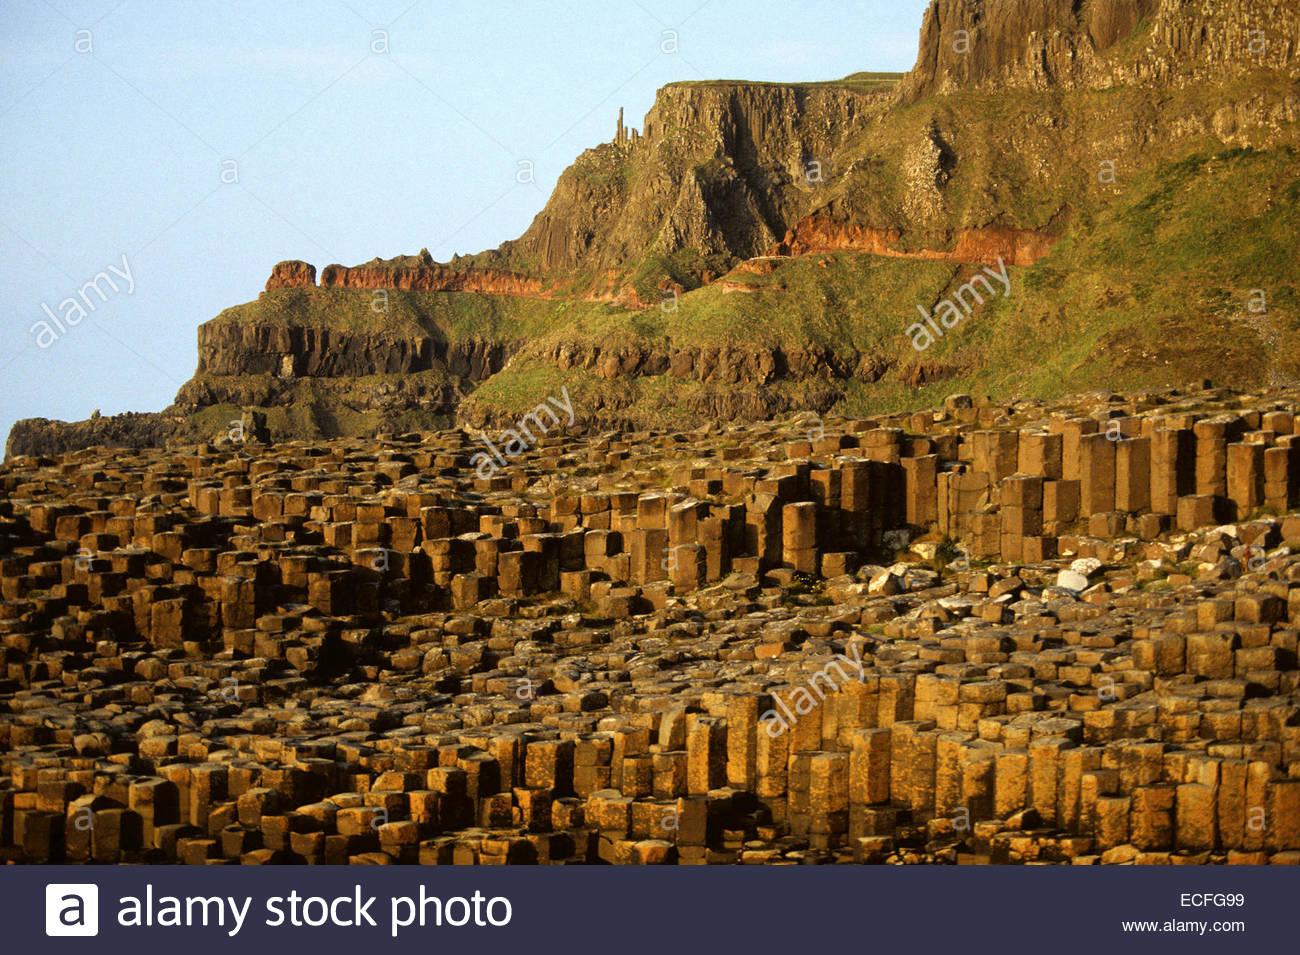 Northern Ireland, Giant's causeway - Stock Image